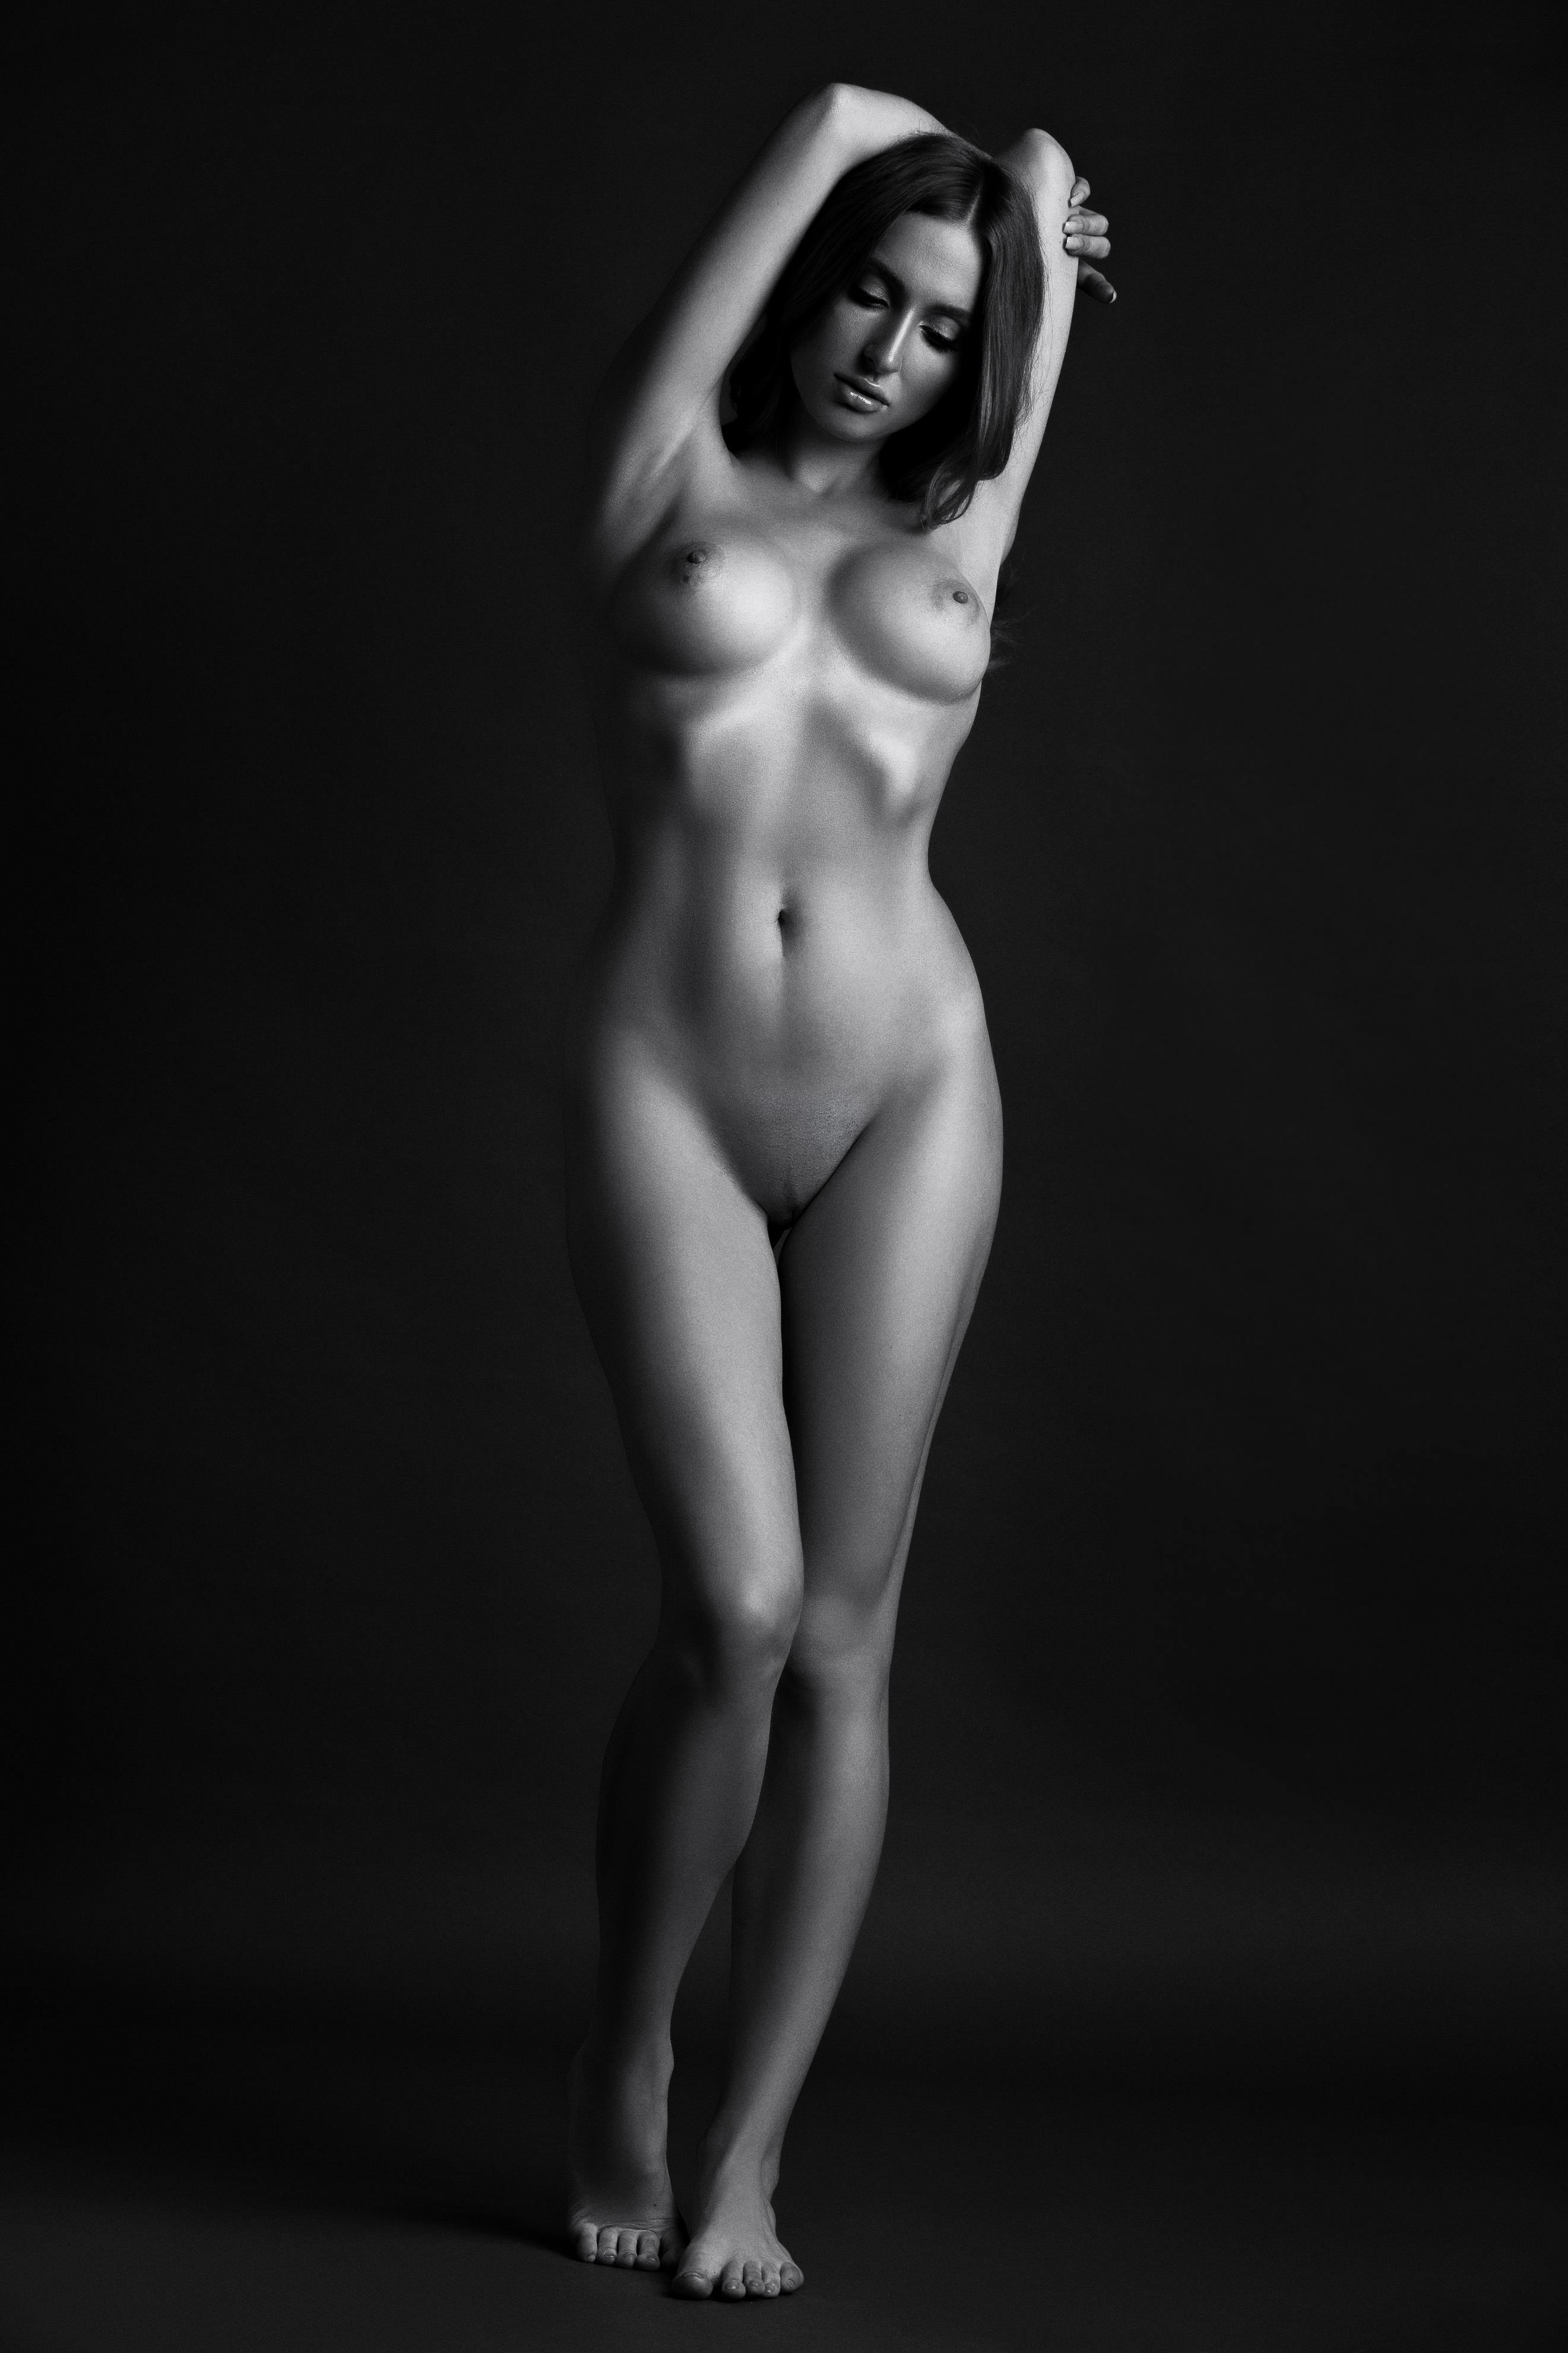 chatroulette nude caroline andersen naken